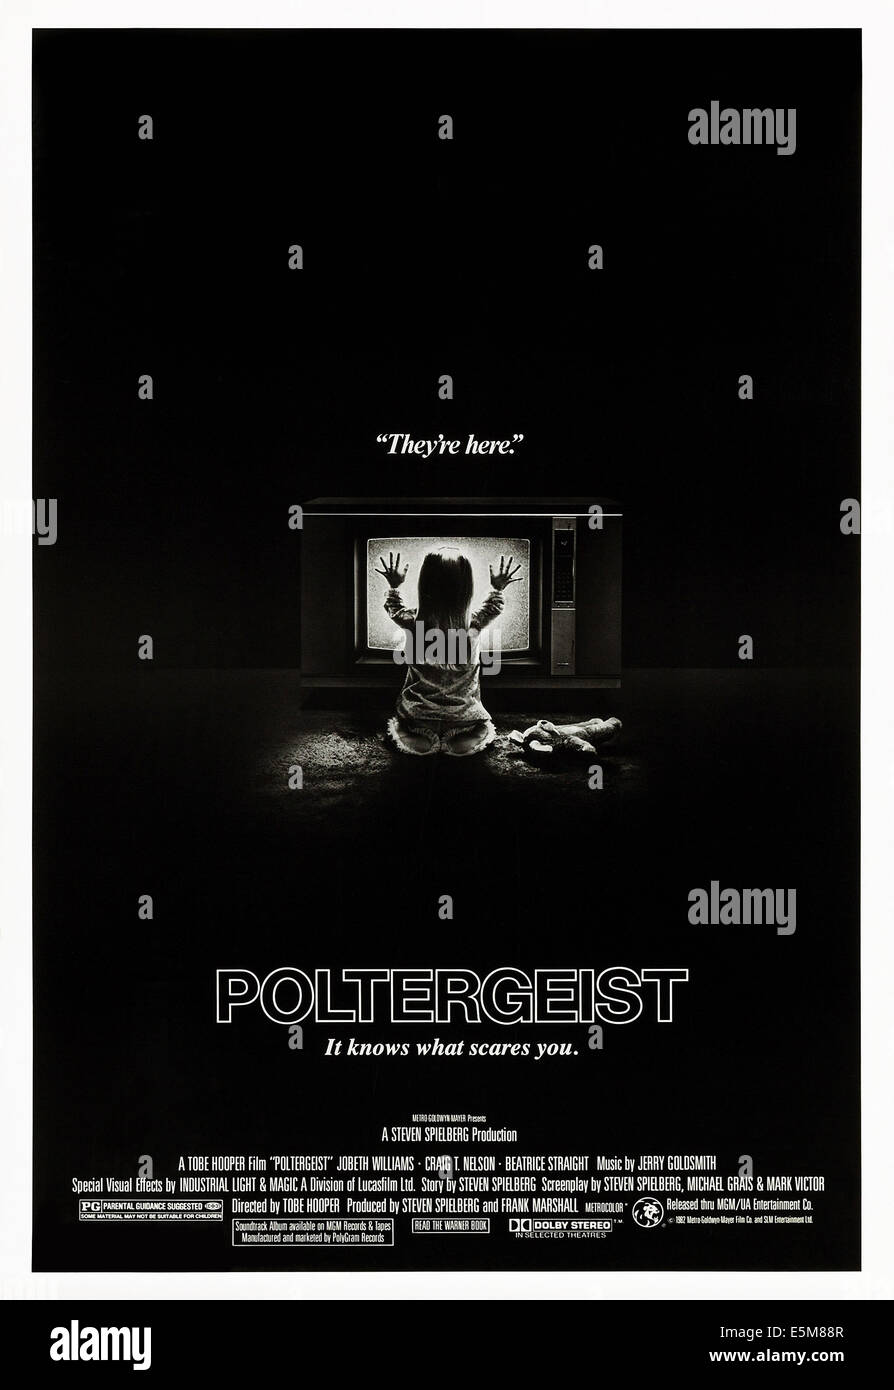 POLTERGEIST, poster art, 1982. - Stock Image